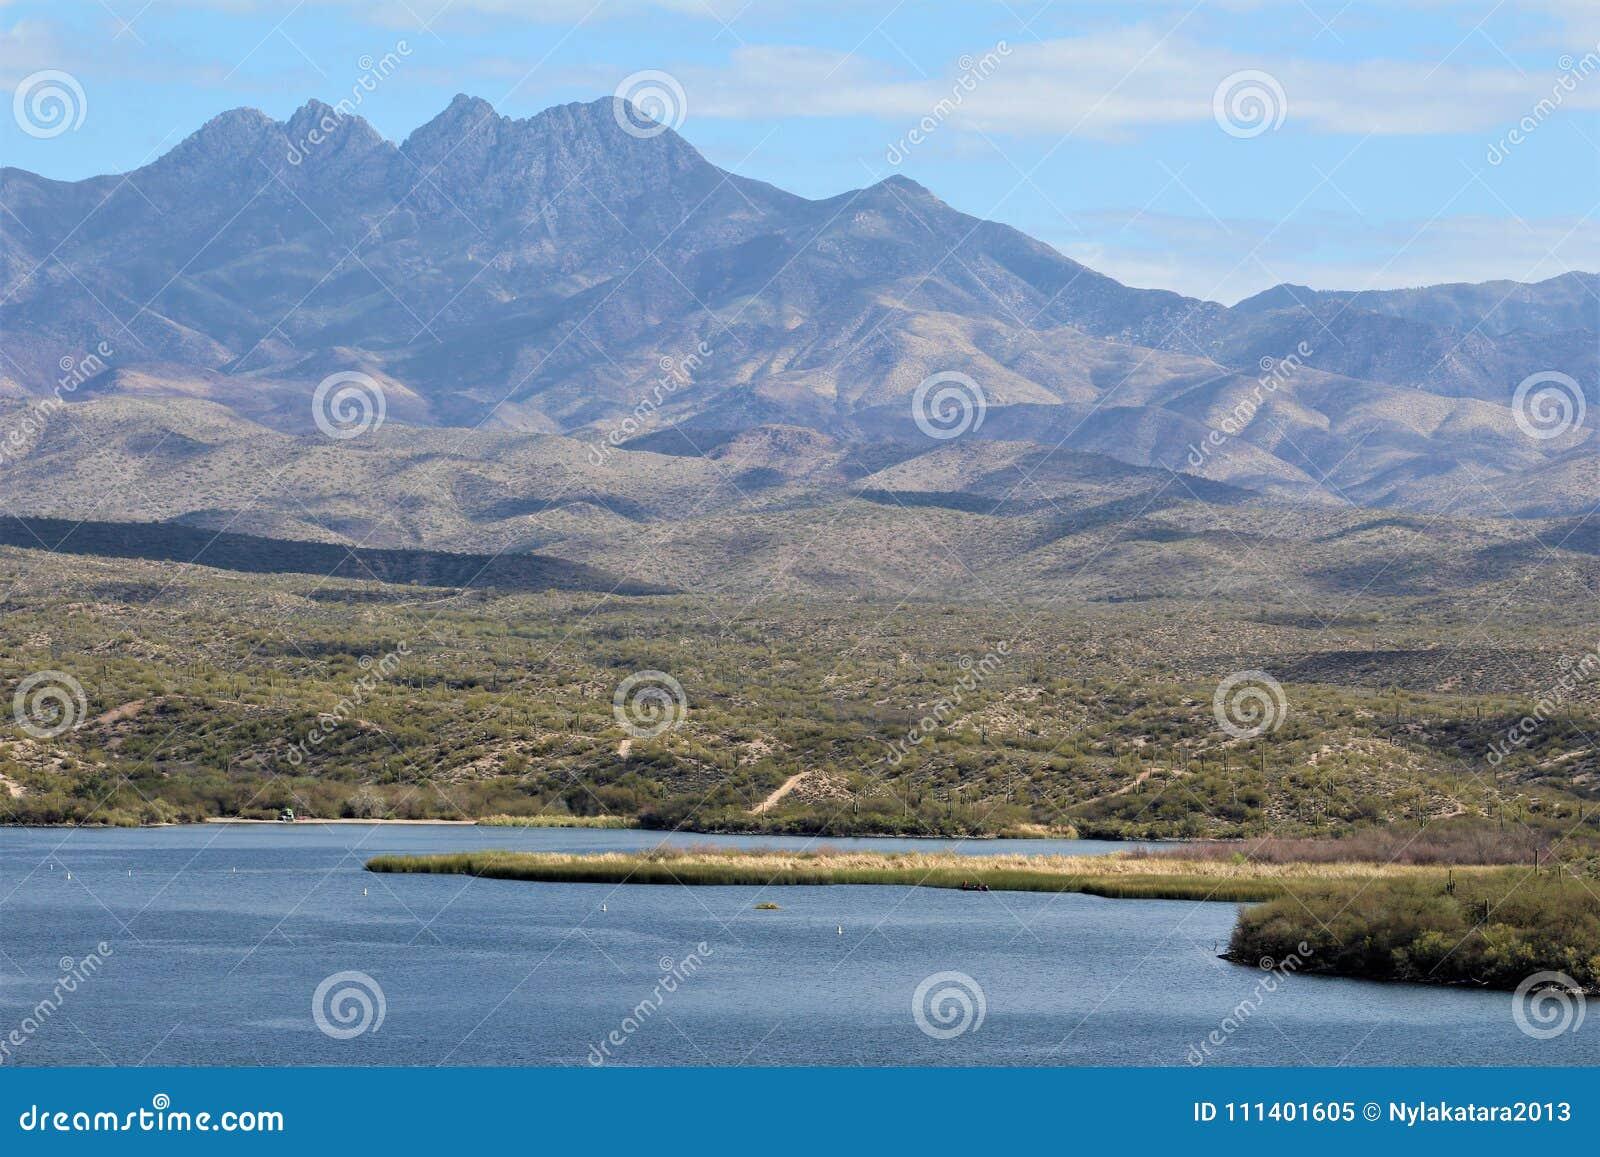 Download Butcher Jones Beach Arizona, Tonto National Forest Stock Image - Image of picnicking, peaks: 111401605